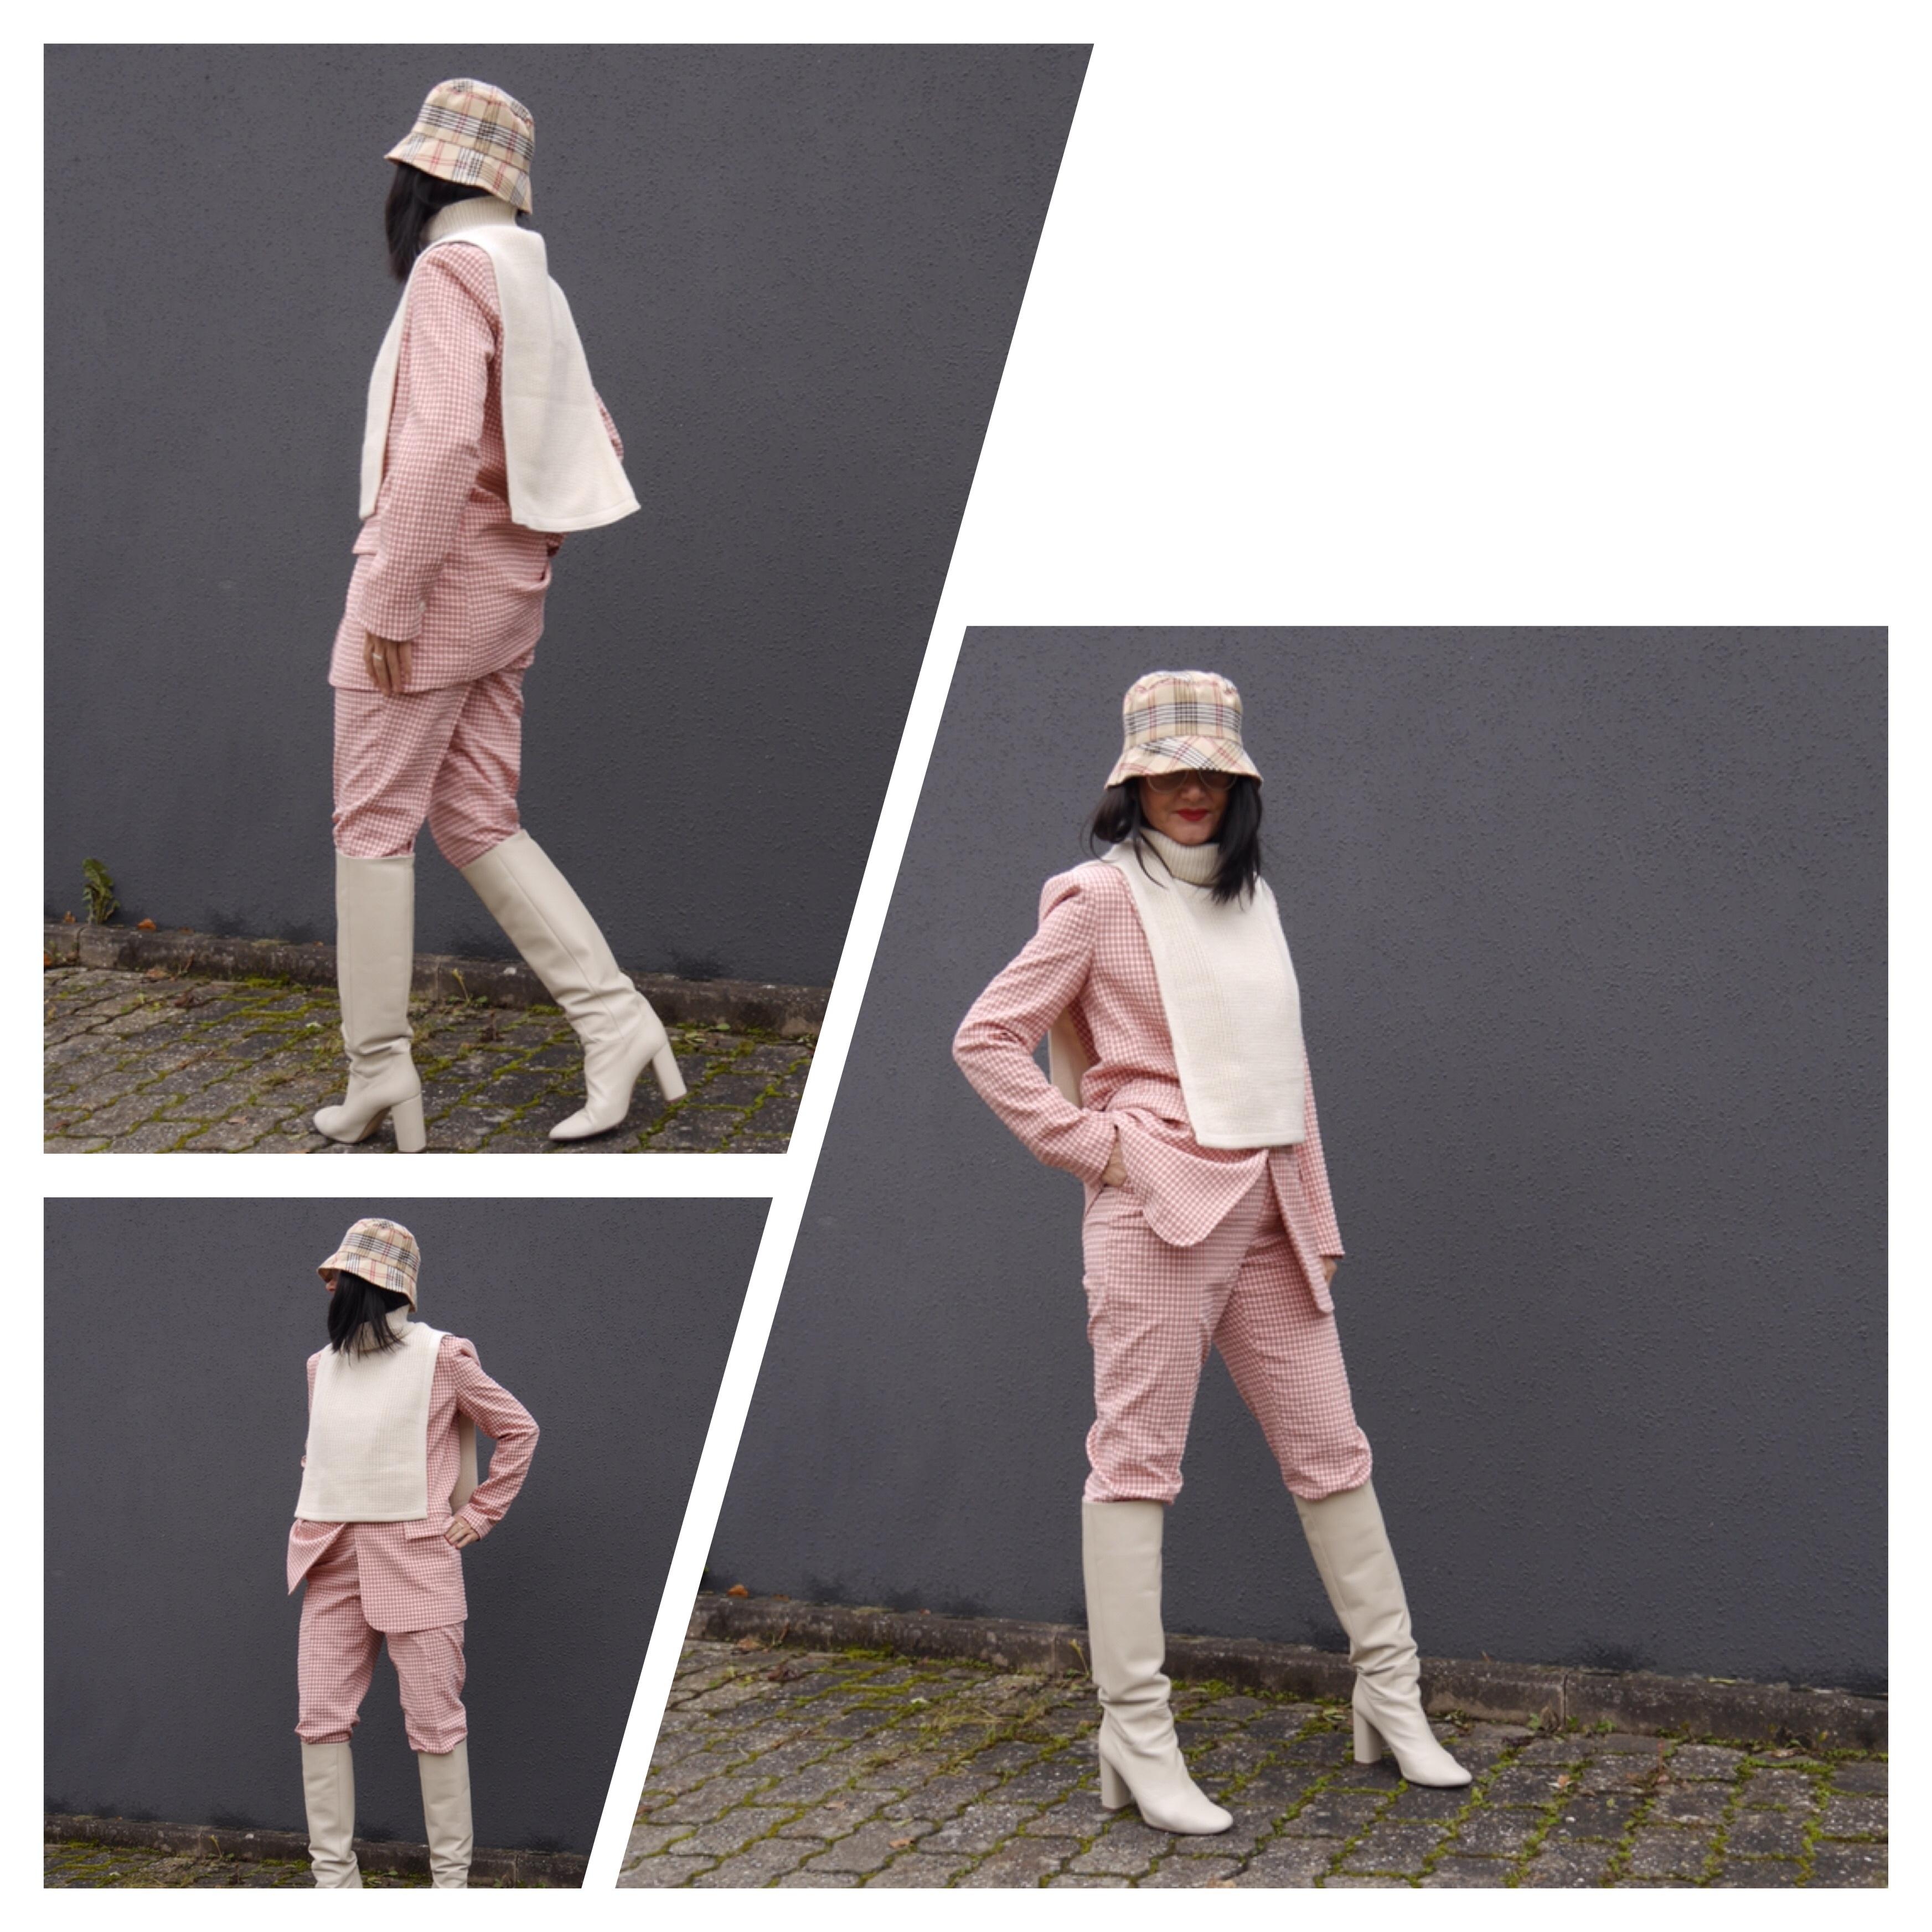 Pullunder über Anzug, Pepita-Anzug, Burberry Hut